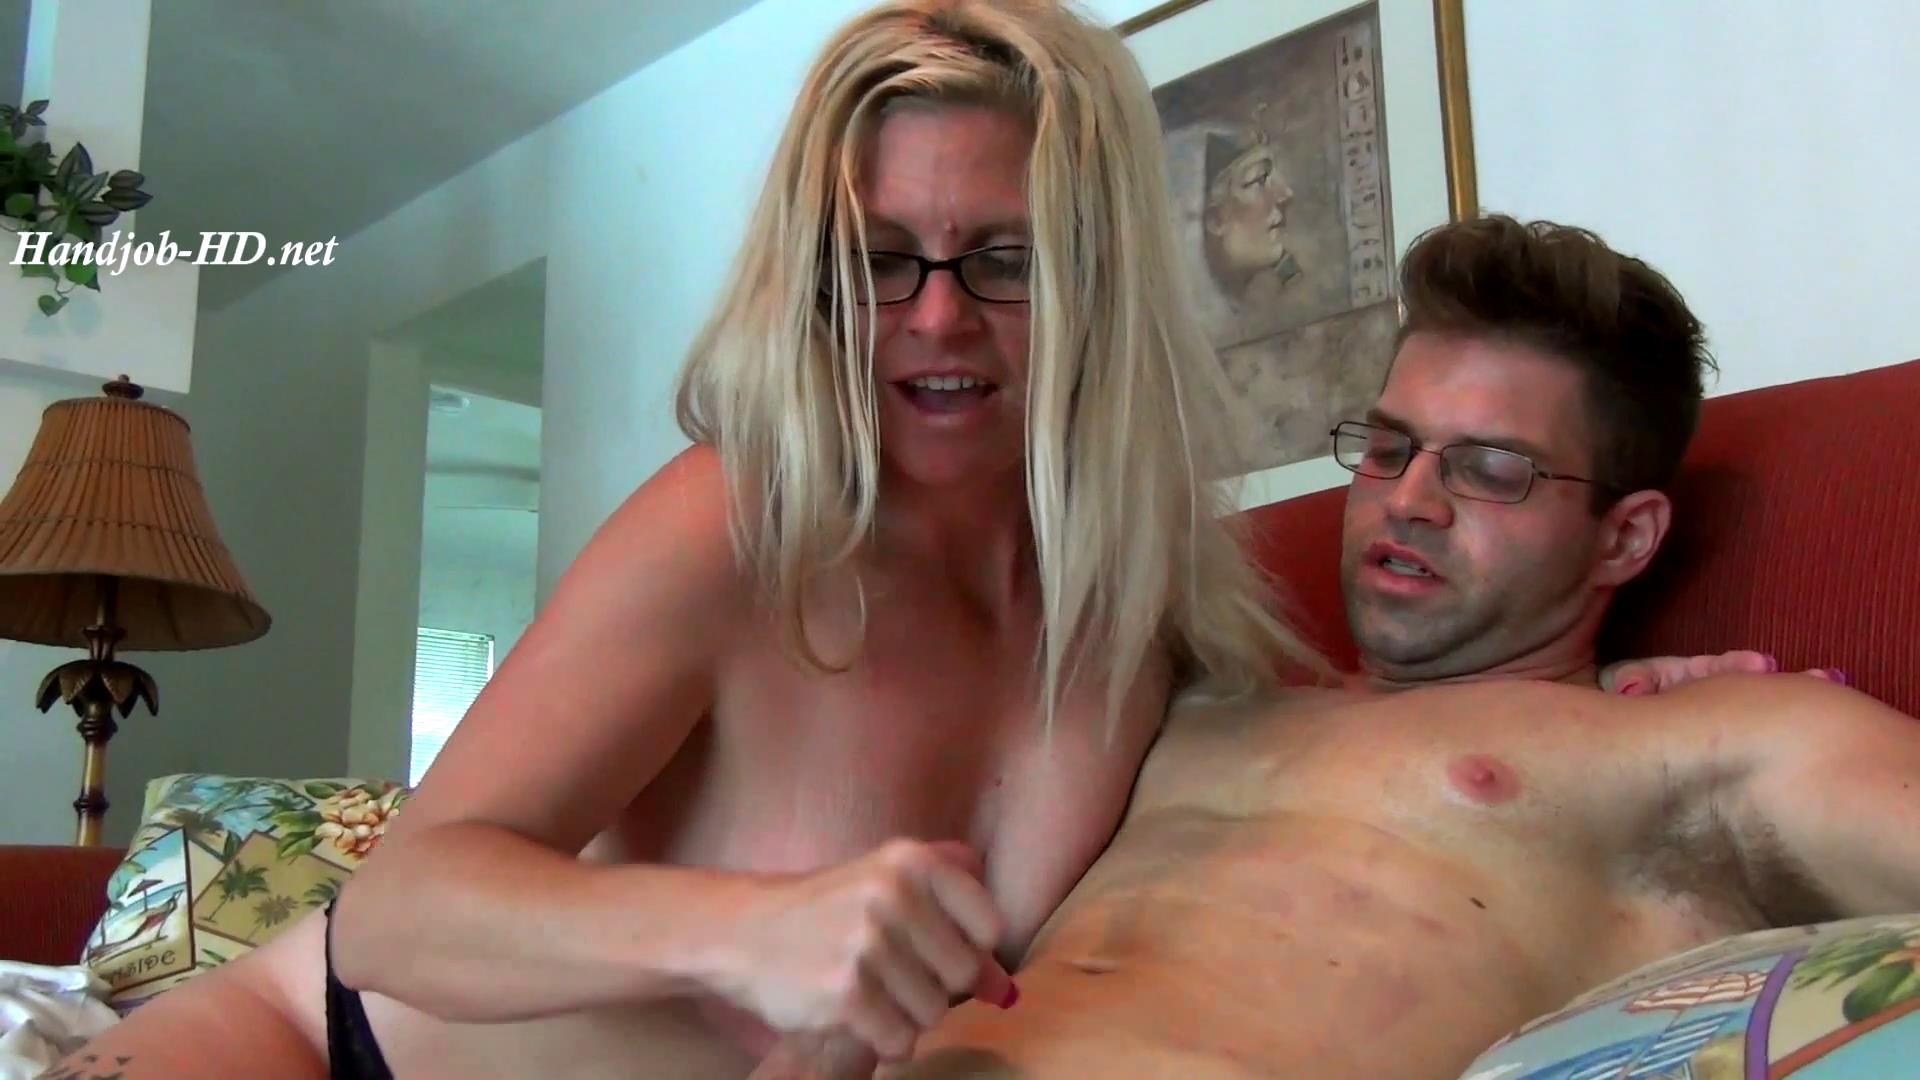 The_Cock_Sucking_Housewife_Episode_7_-_JERKY_GIRLS.jpg